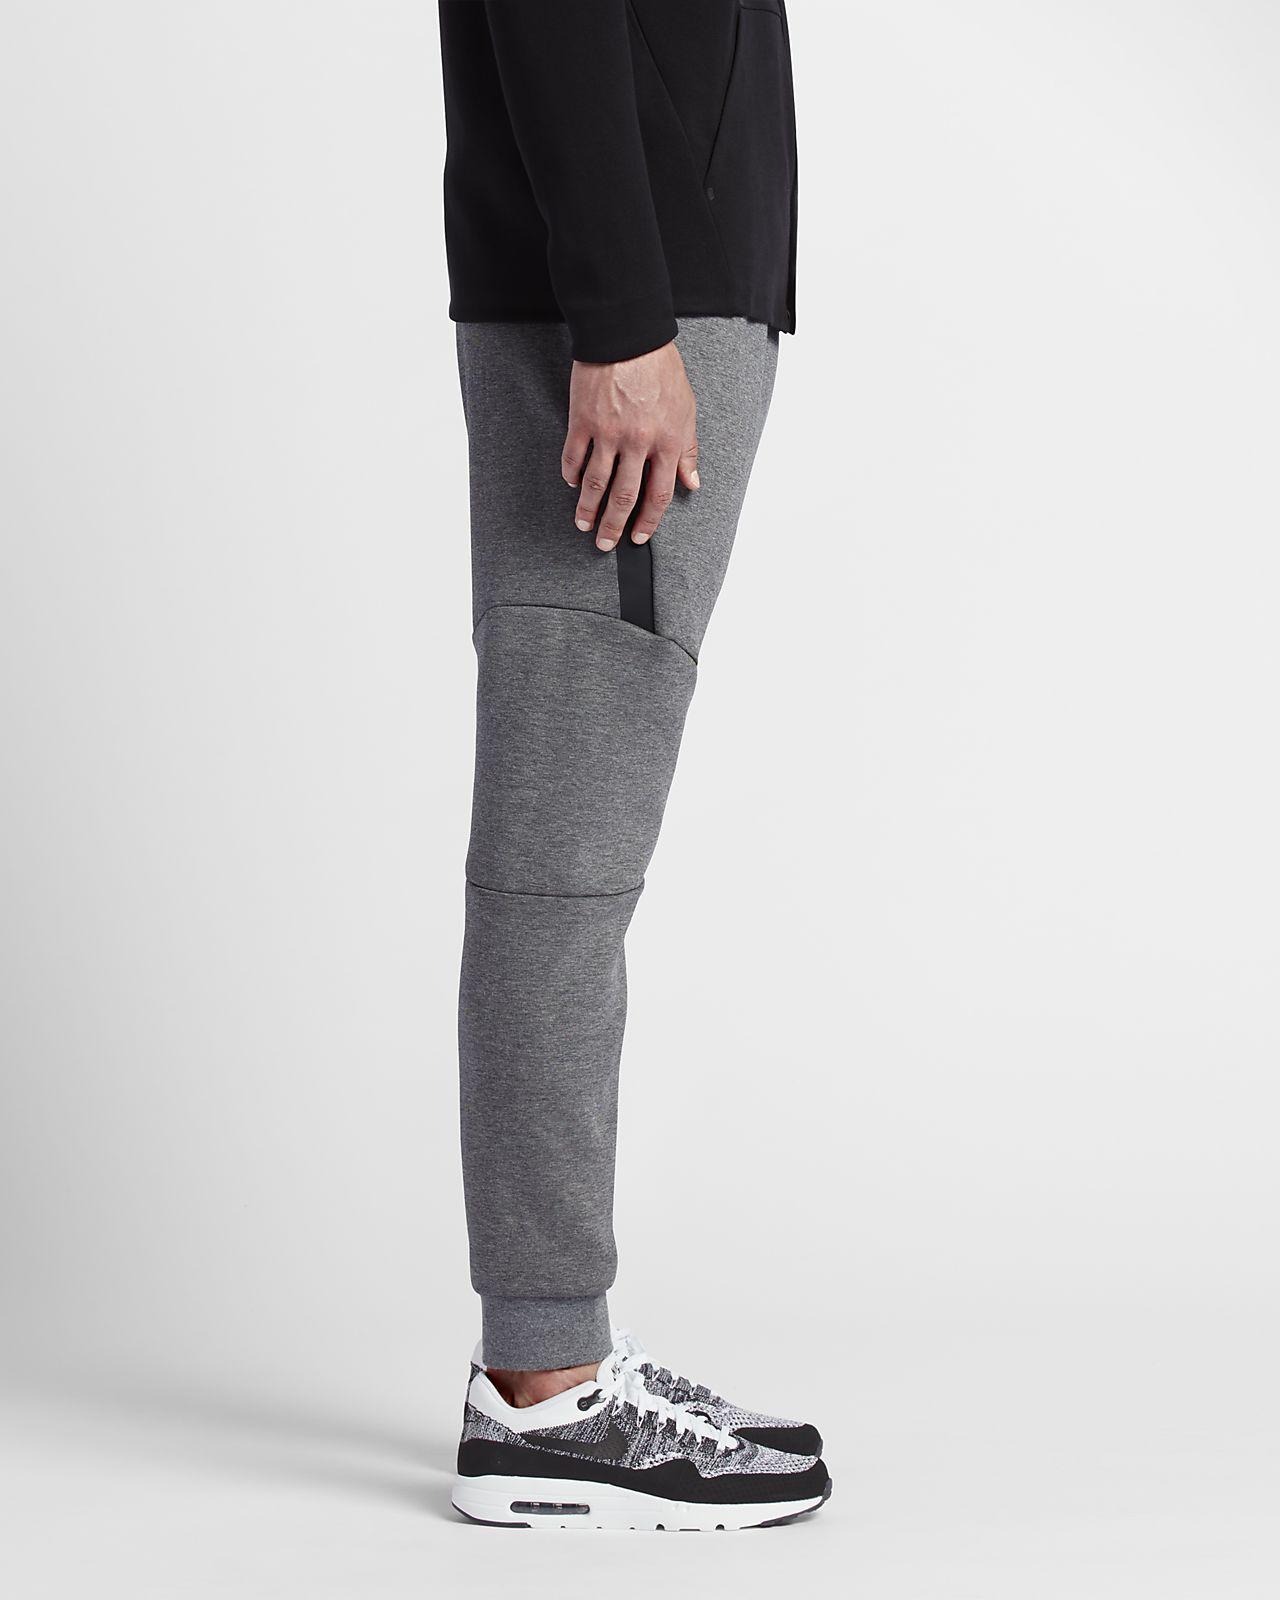 pantalones deportivos para hombre nike sportswear tech fleece mx. Black Bedroom Furniture Sets. Home Design Ideas